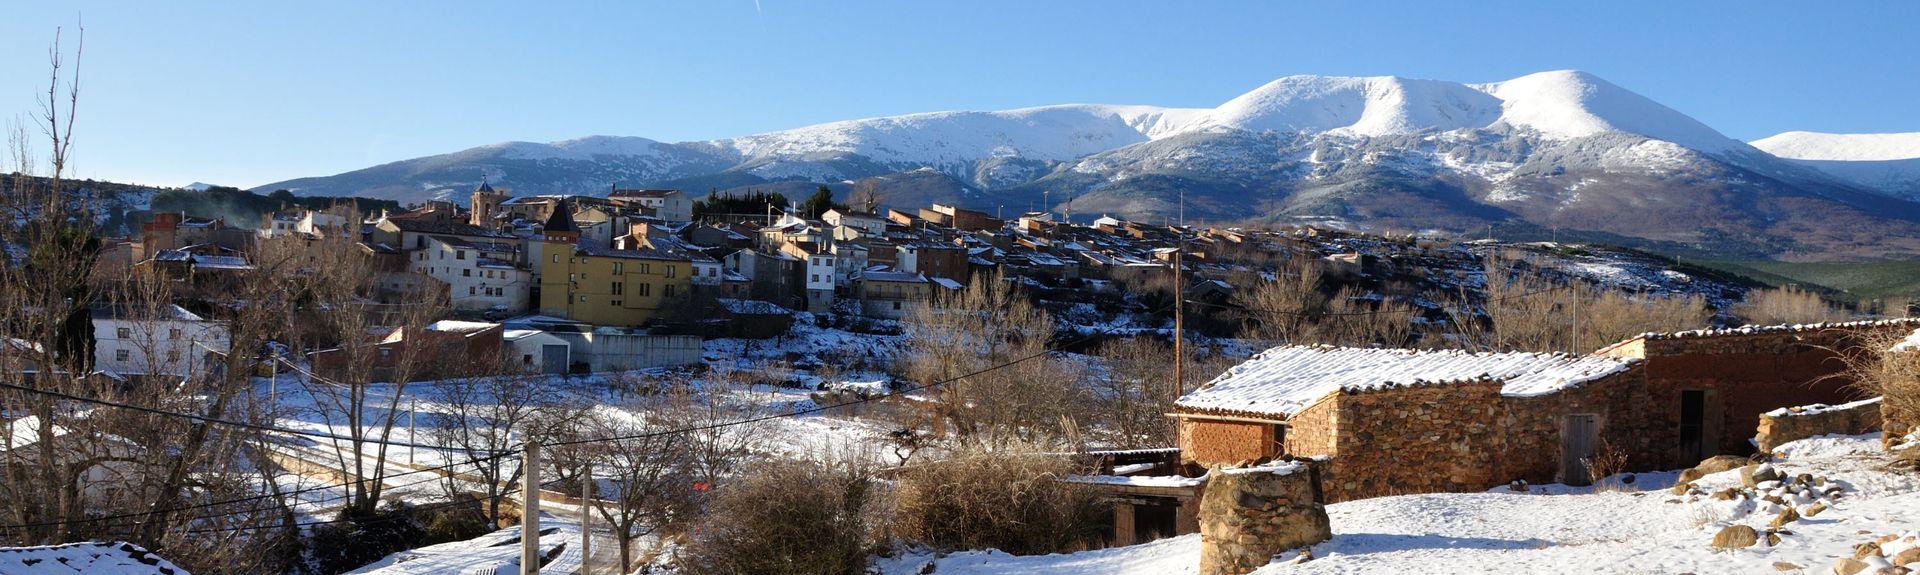 Ambel, Aragón, Spania